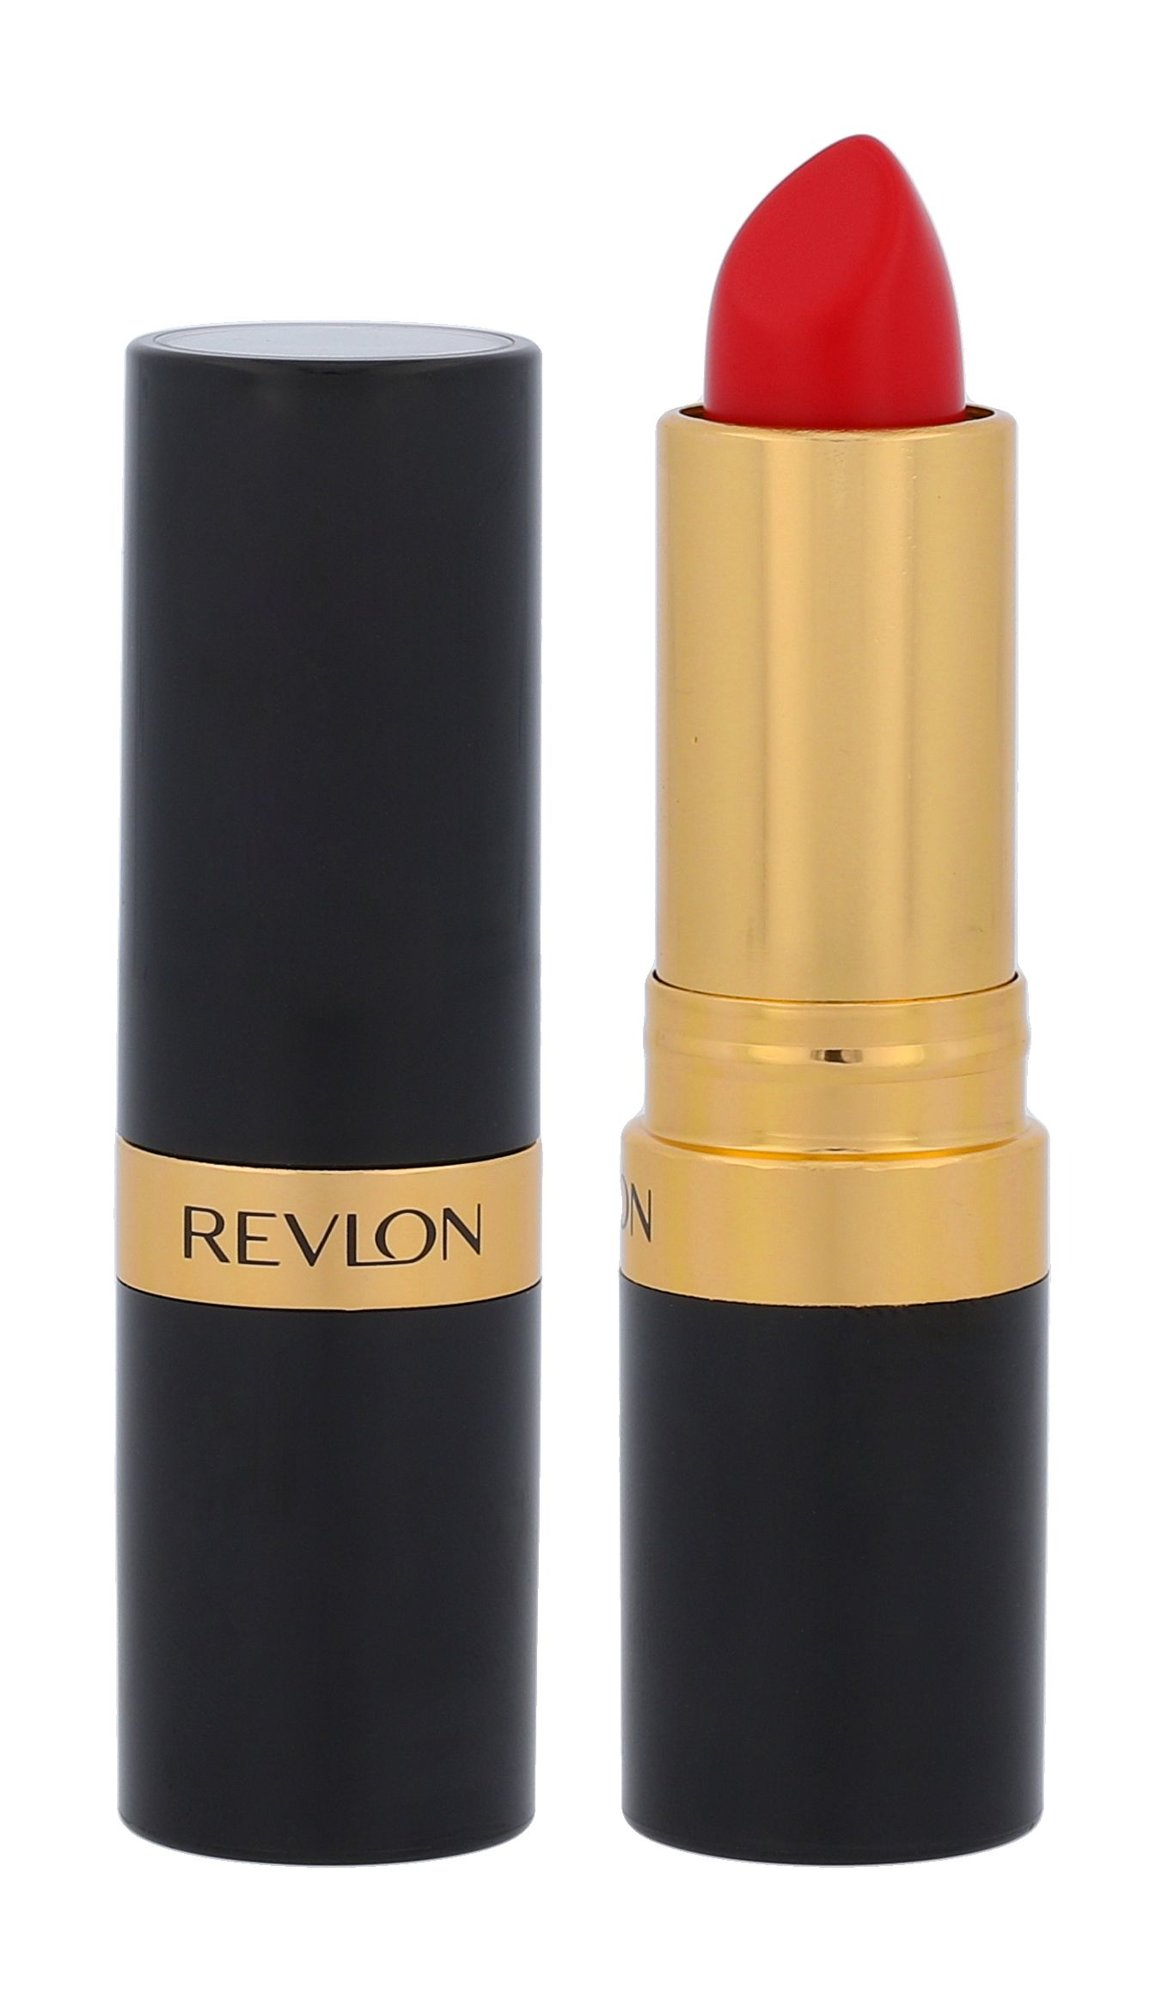 Revlon Super Lustrous Cosmetic 4,2ml 720 Fire & Ice